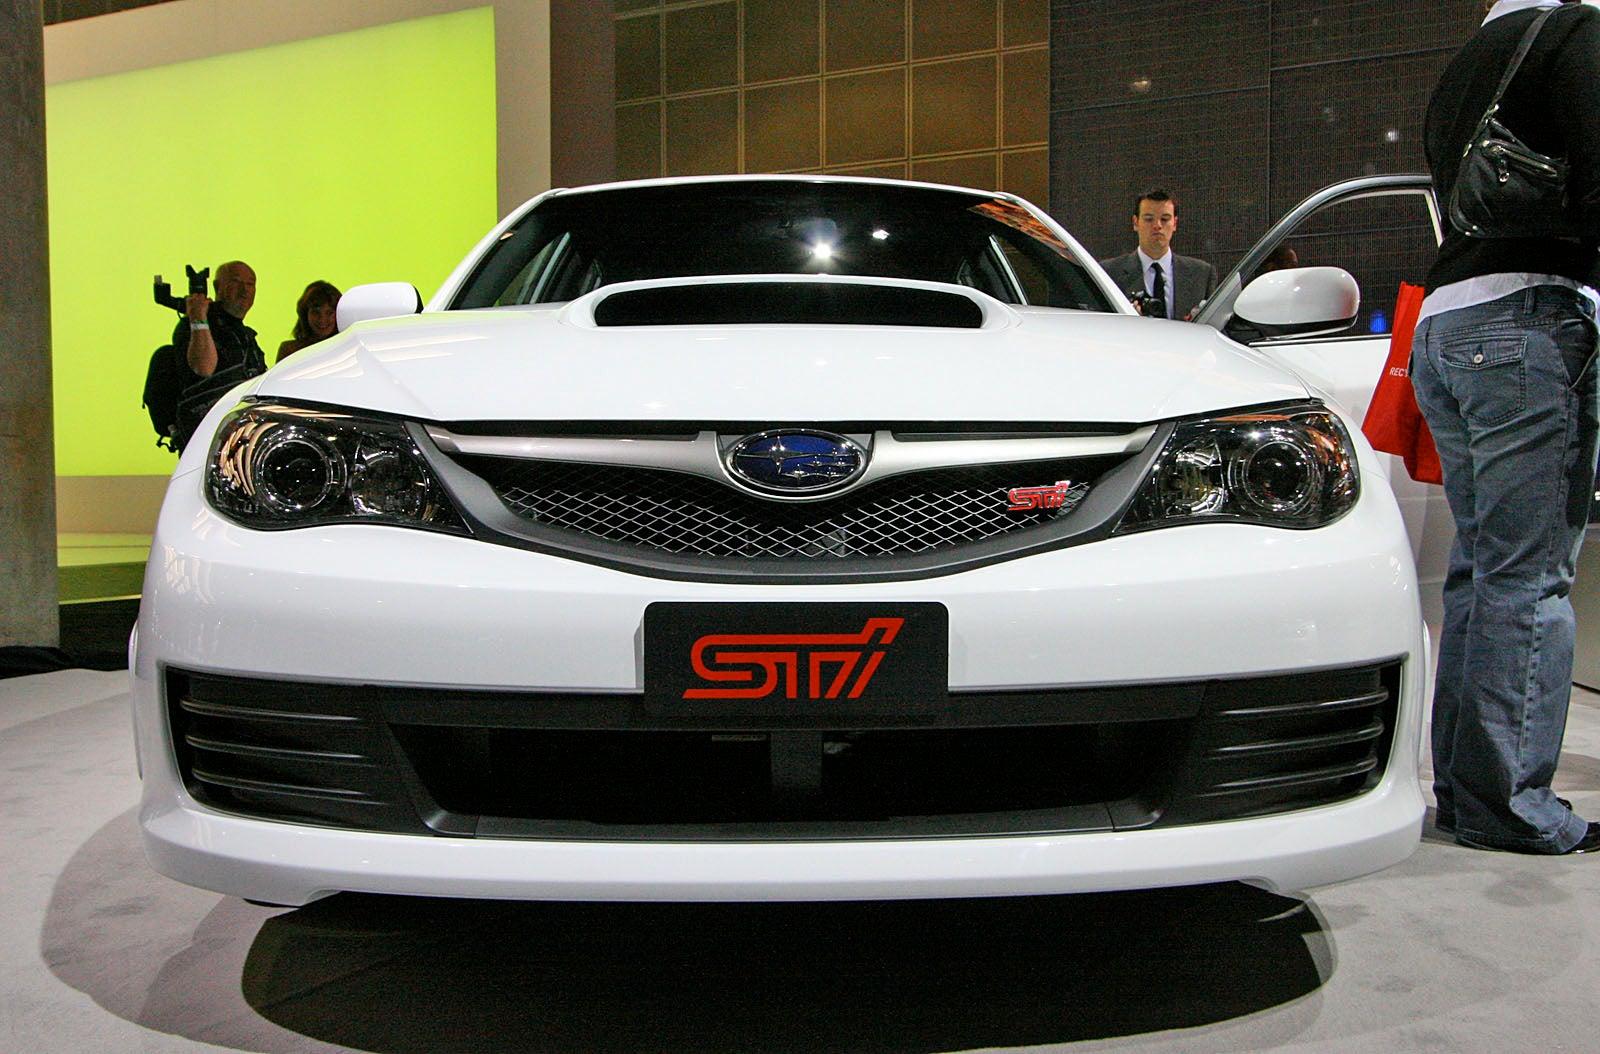 2010 subaru impreza wrx sti special edition because rh jalopnik com Matix Auto Subaru WRX Matix Auto Subaru WRX